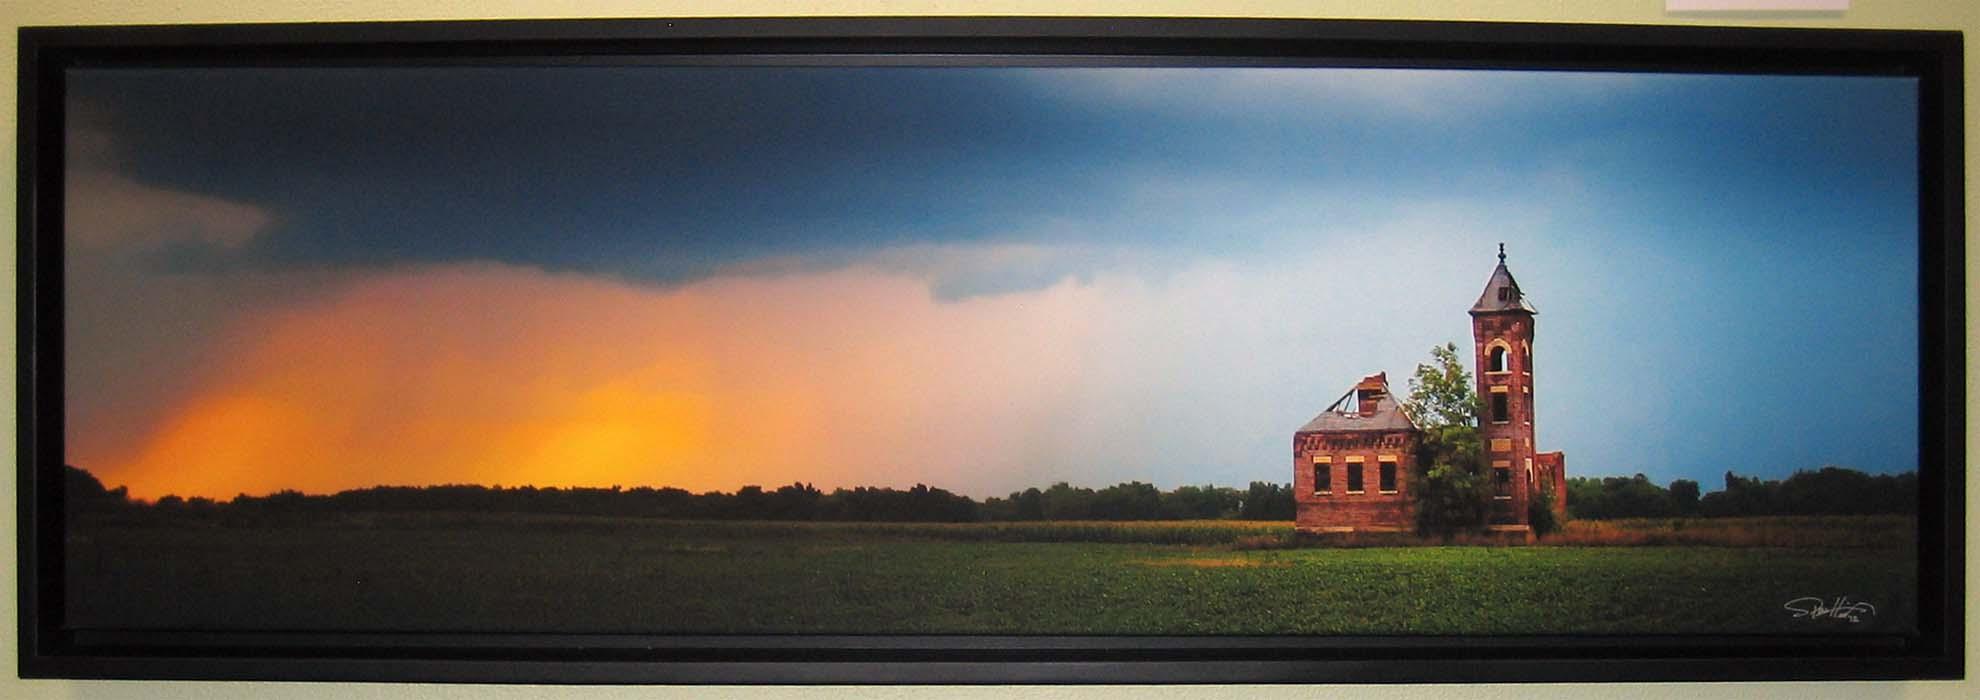 © Hirsch (1) photograph on canvas